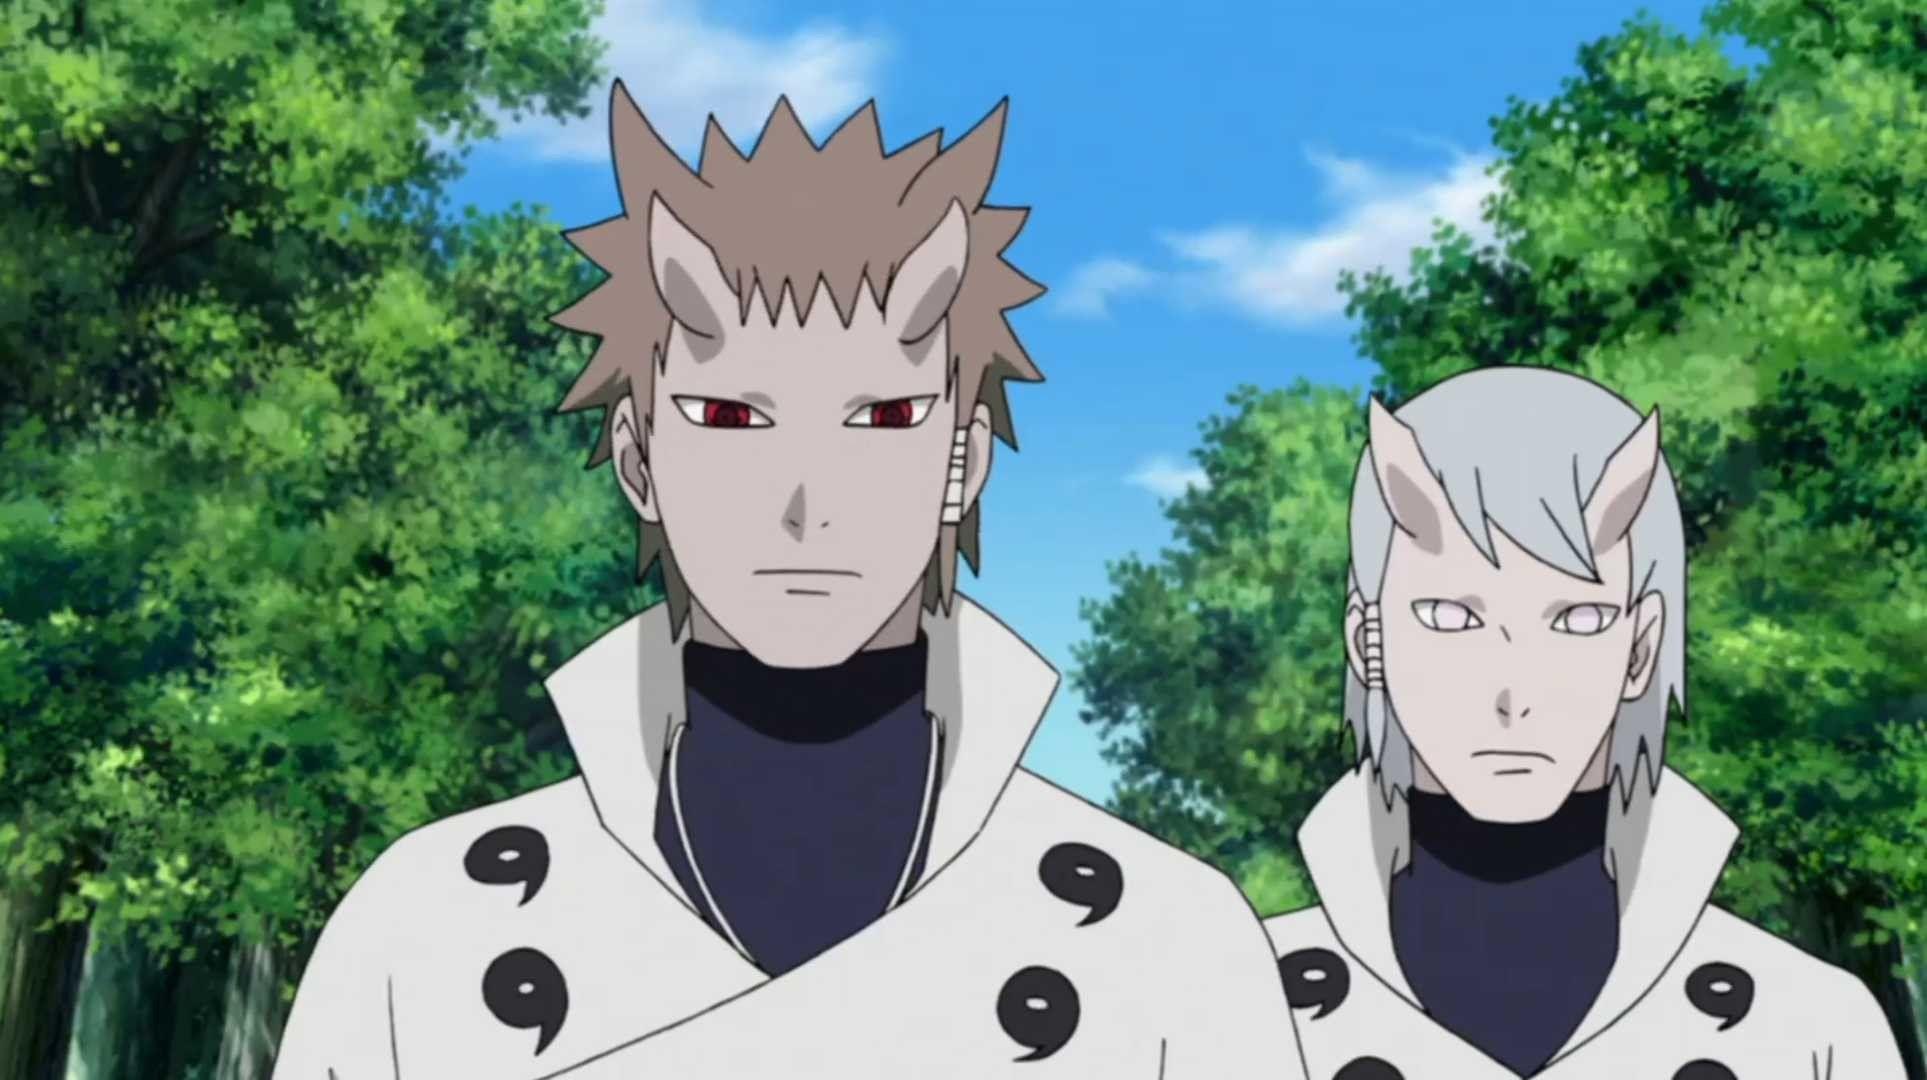 (source: Tumblr) Kaguya's sons Hogoromo and Haruma